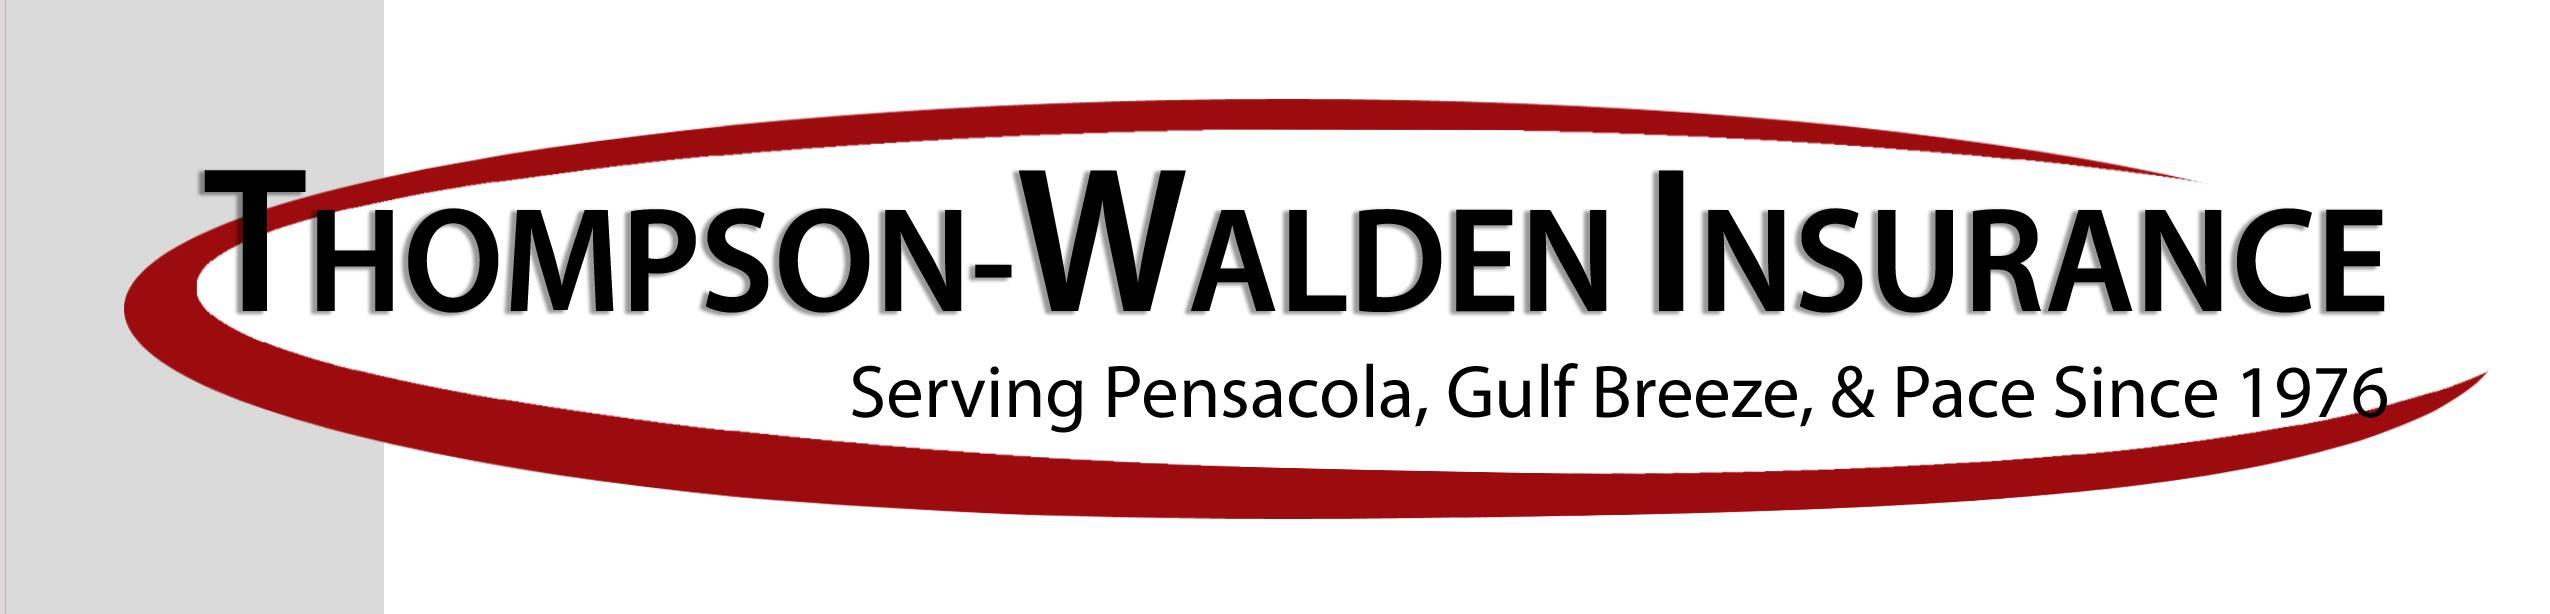 Thompson- Walden Insurance